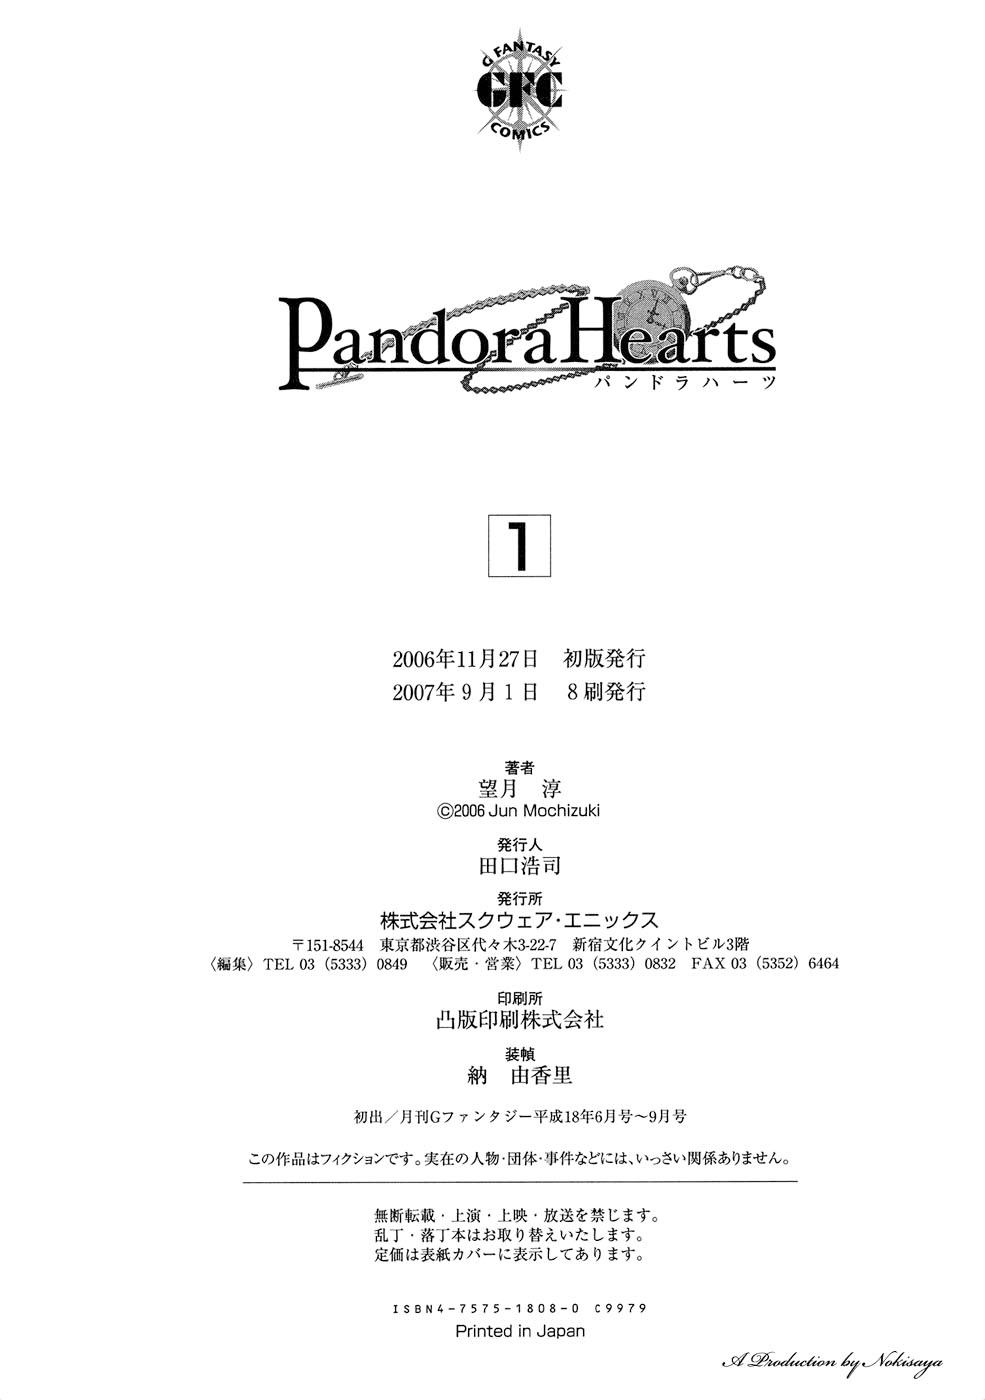 Pandora Hearts chương 004 - retrace: iv rendezvous trang 45